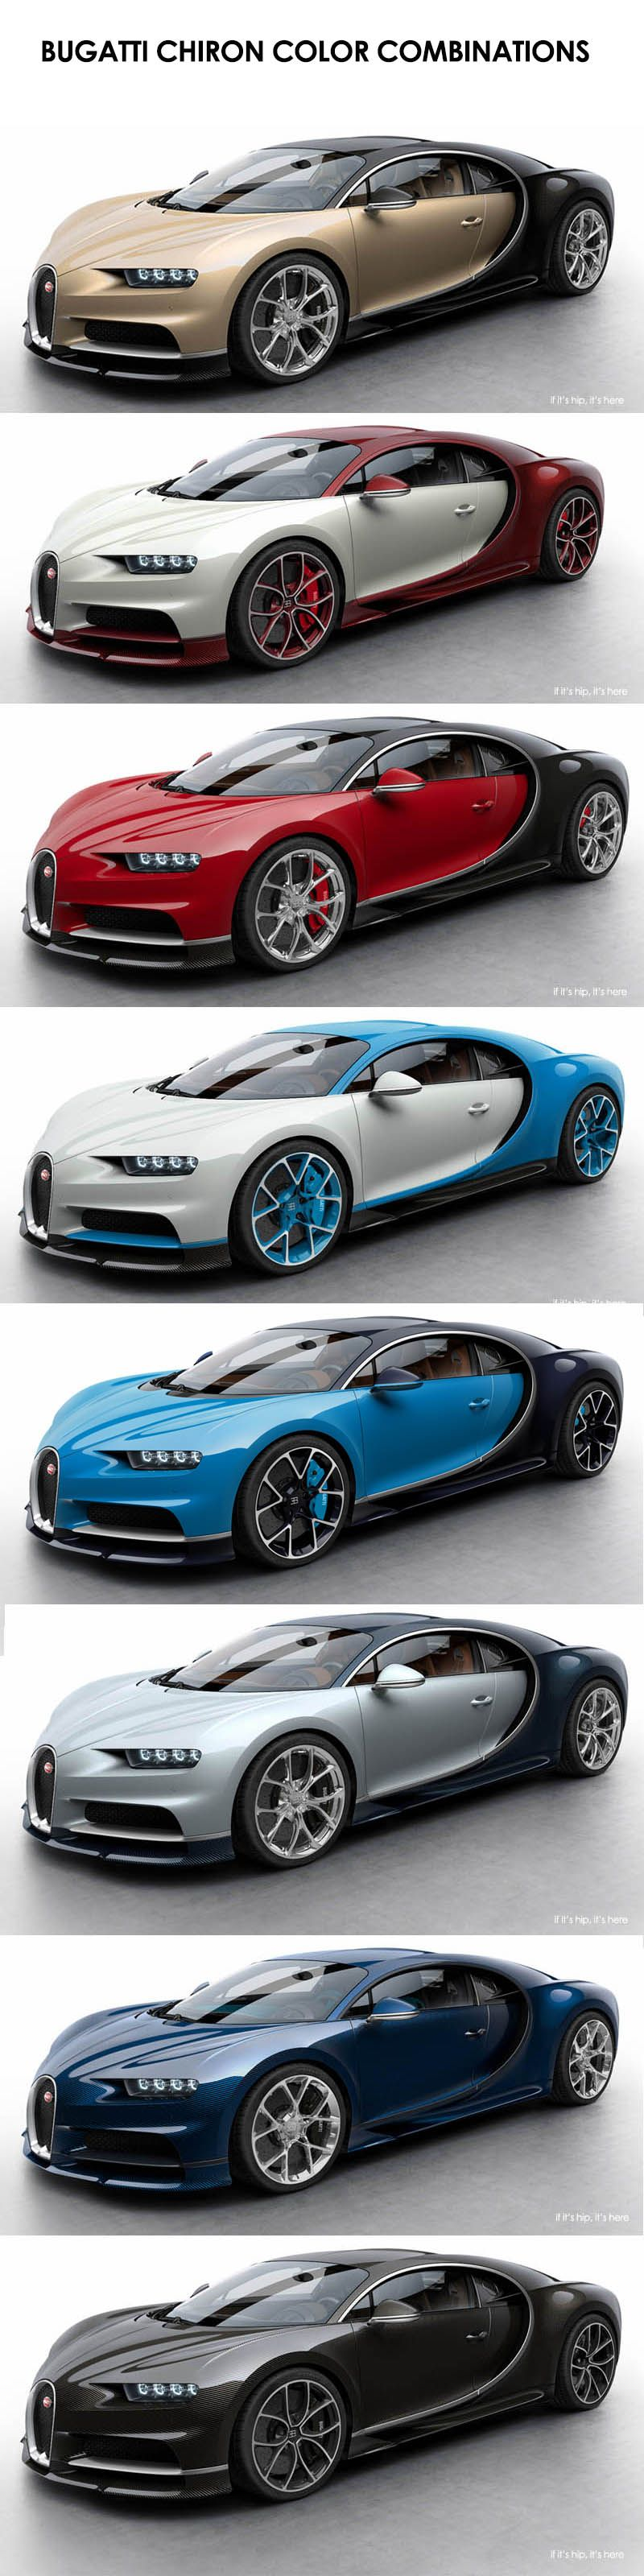 b29f6b8259167bc2f9ff5564d7163098 Stunning Bugatti Veyron Price In Brazil Cars Trend